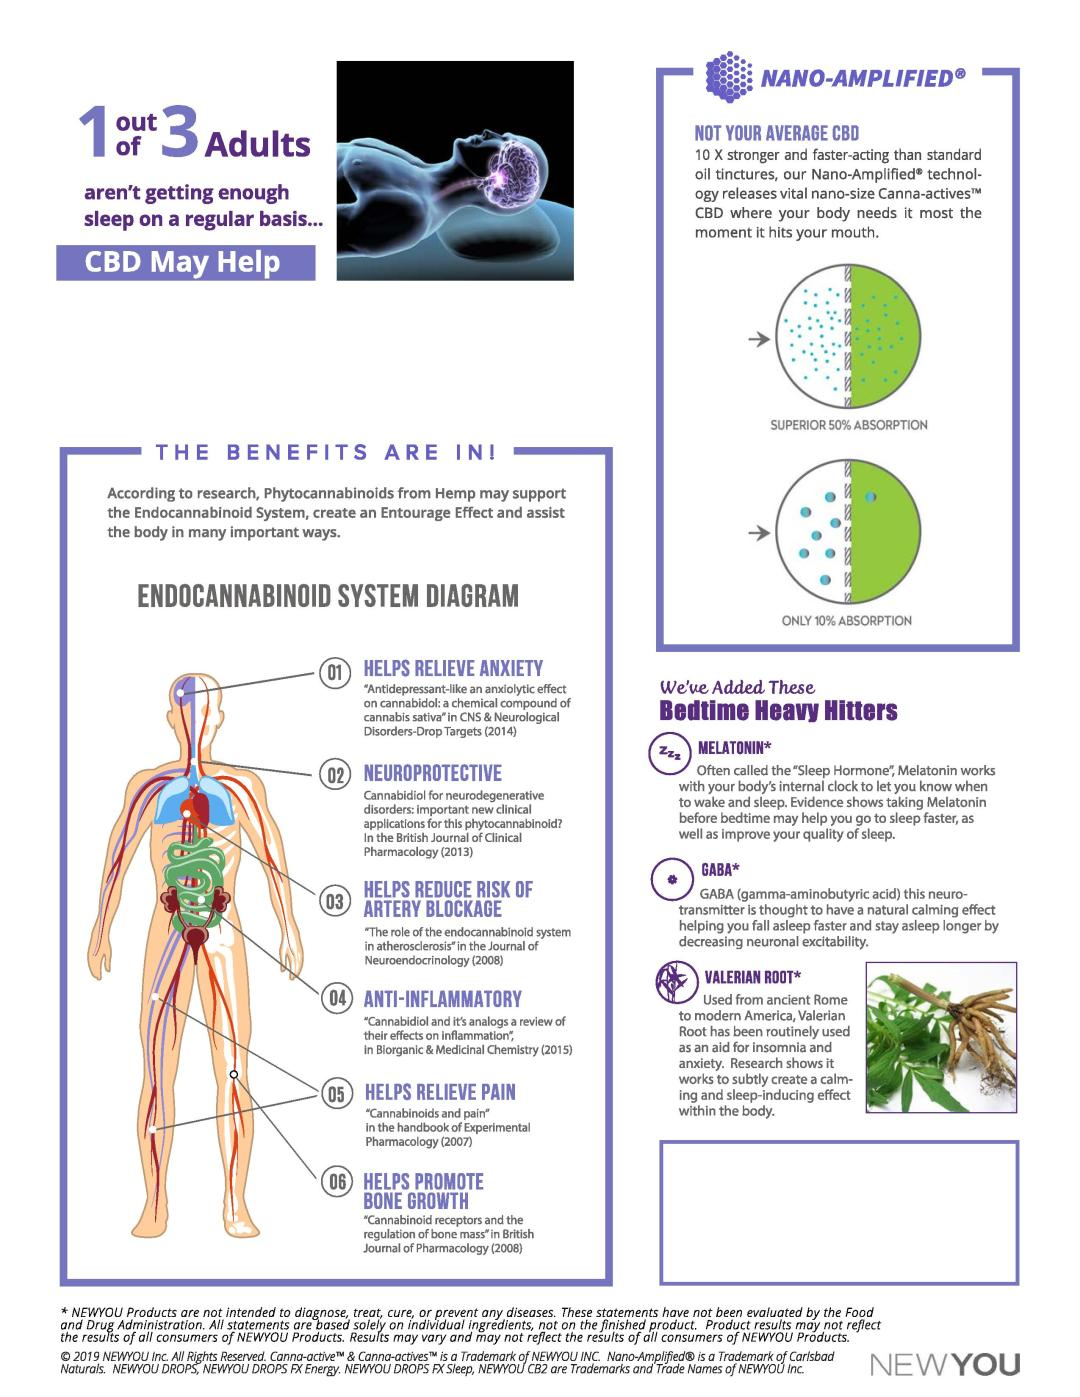 NEWYOU CBD DROPS FX sleep with melatonin